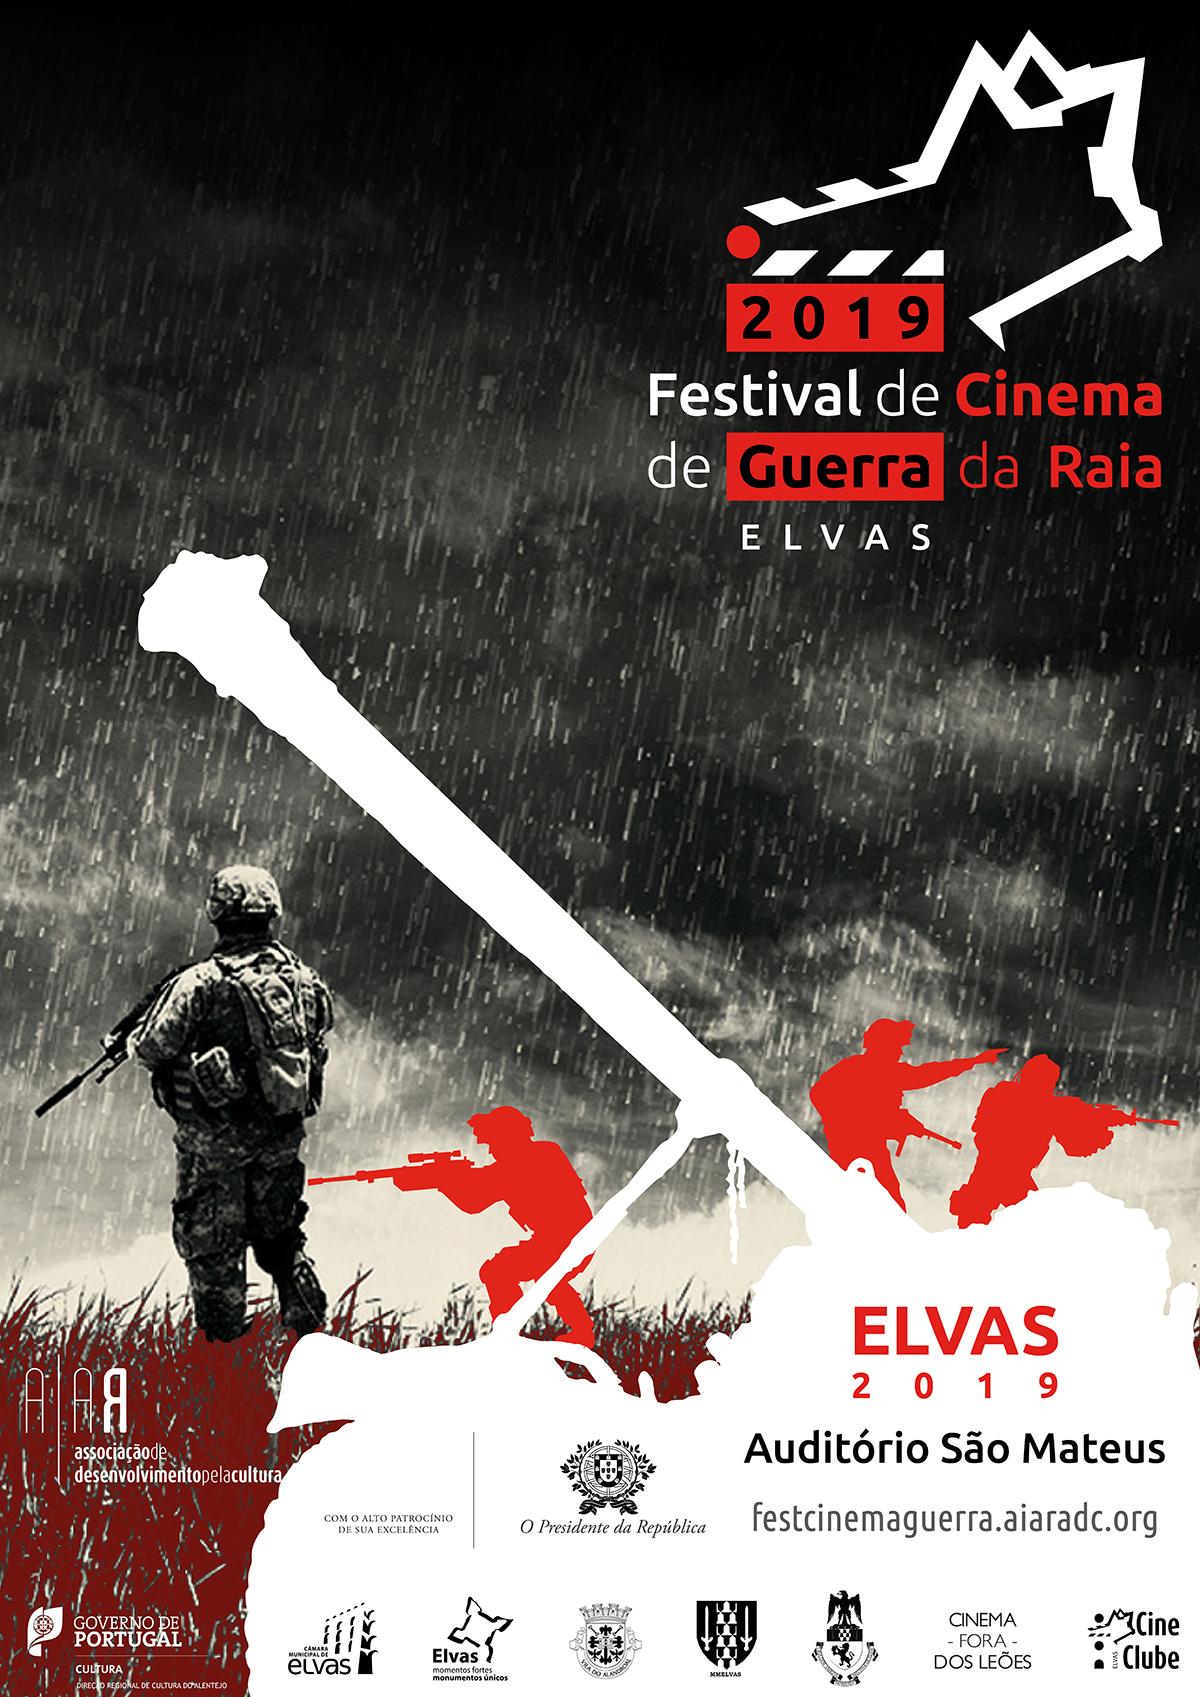 cartaz_festival_cinema_guerra_elvas_190214